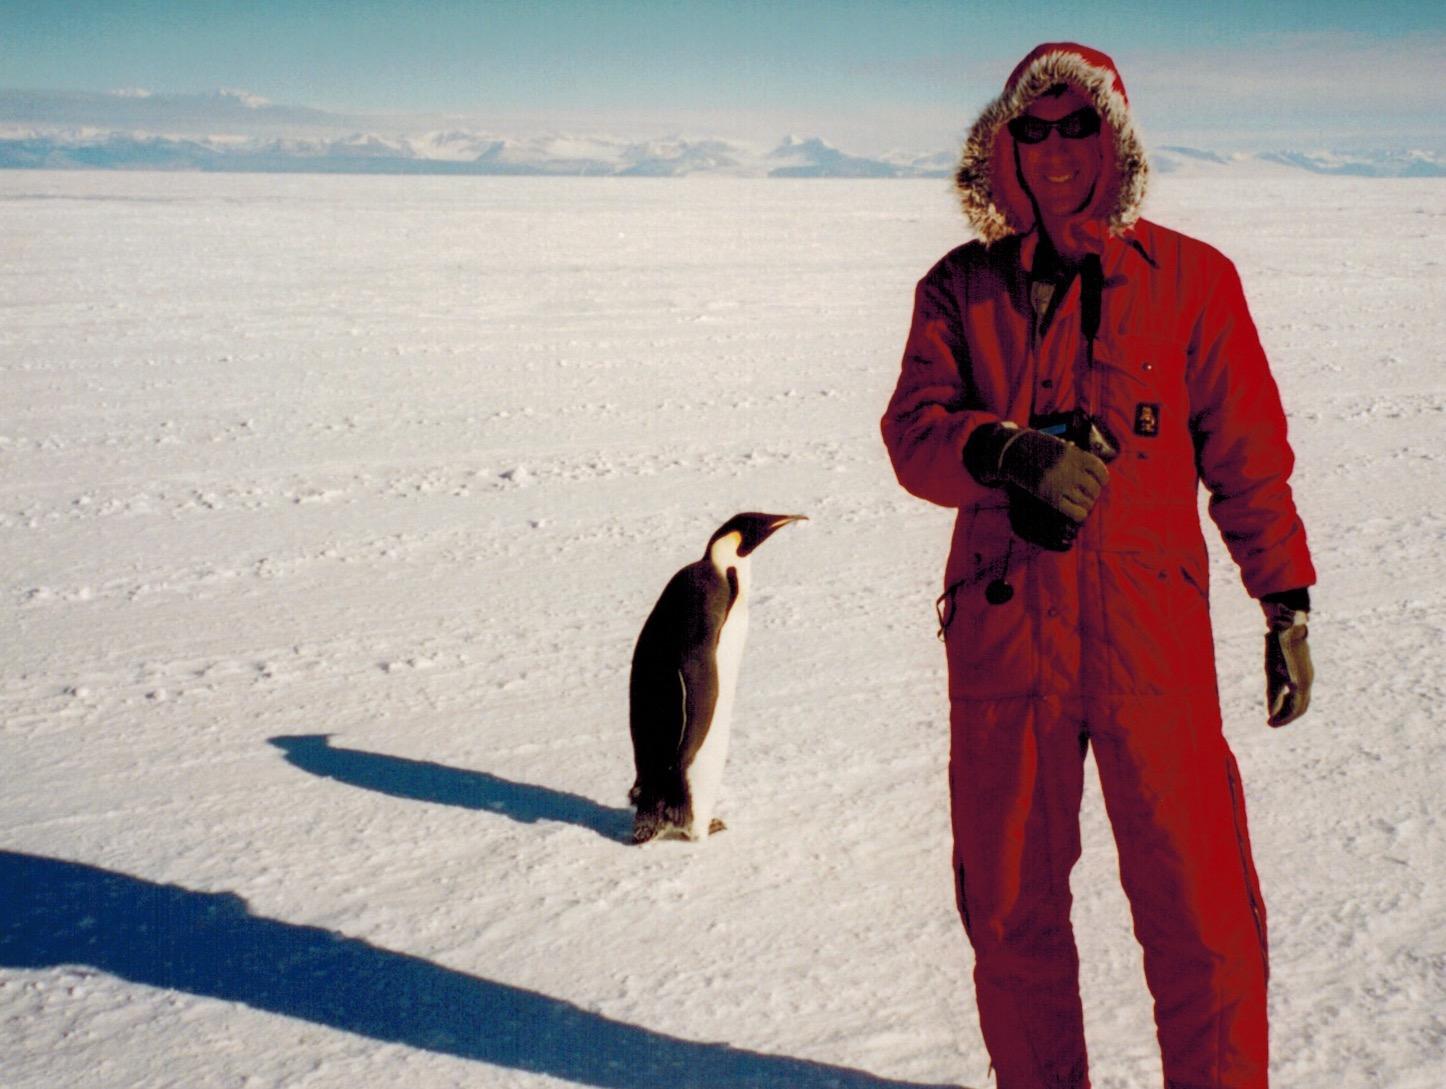 McMurdo Station, Antarctica (USAF, 2000)